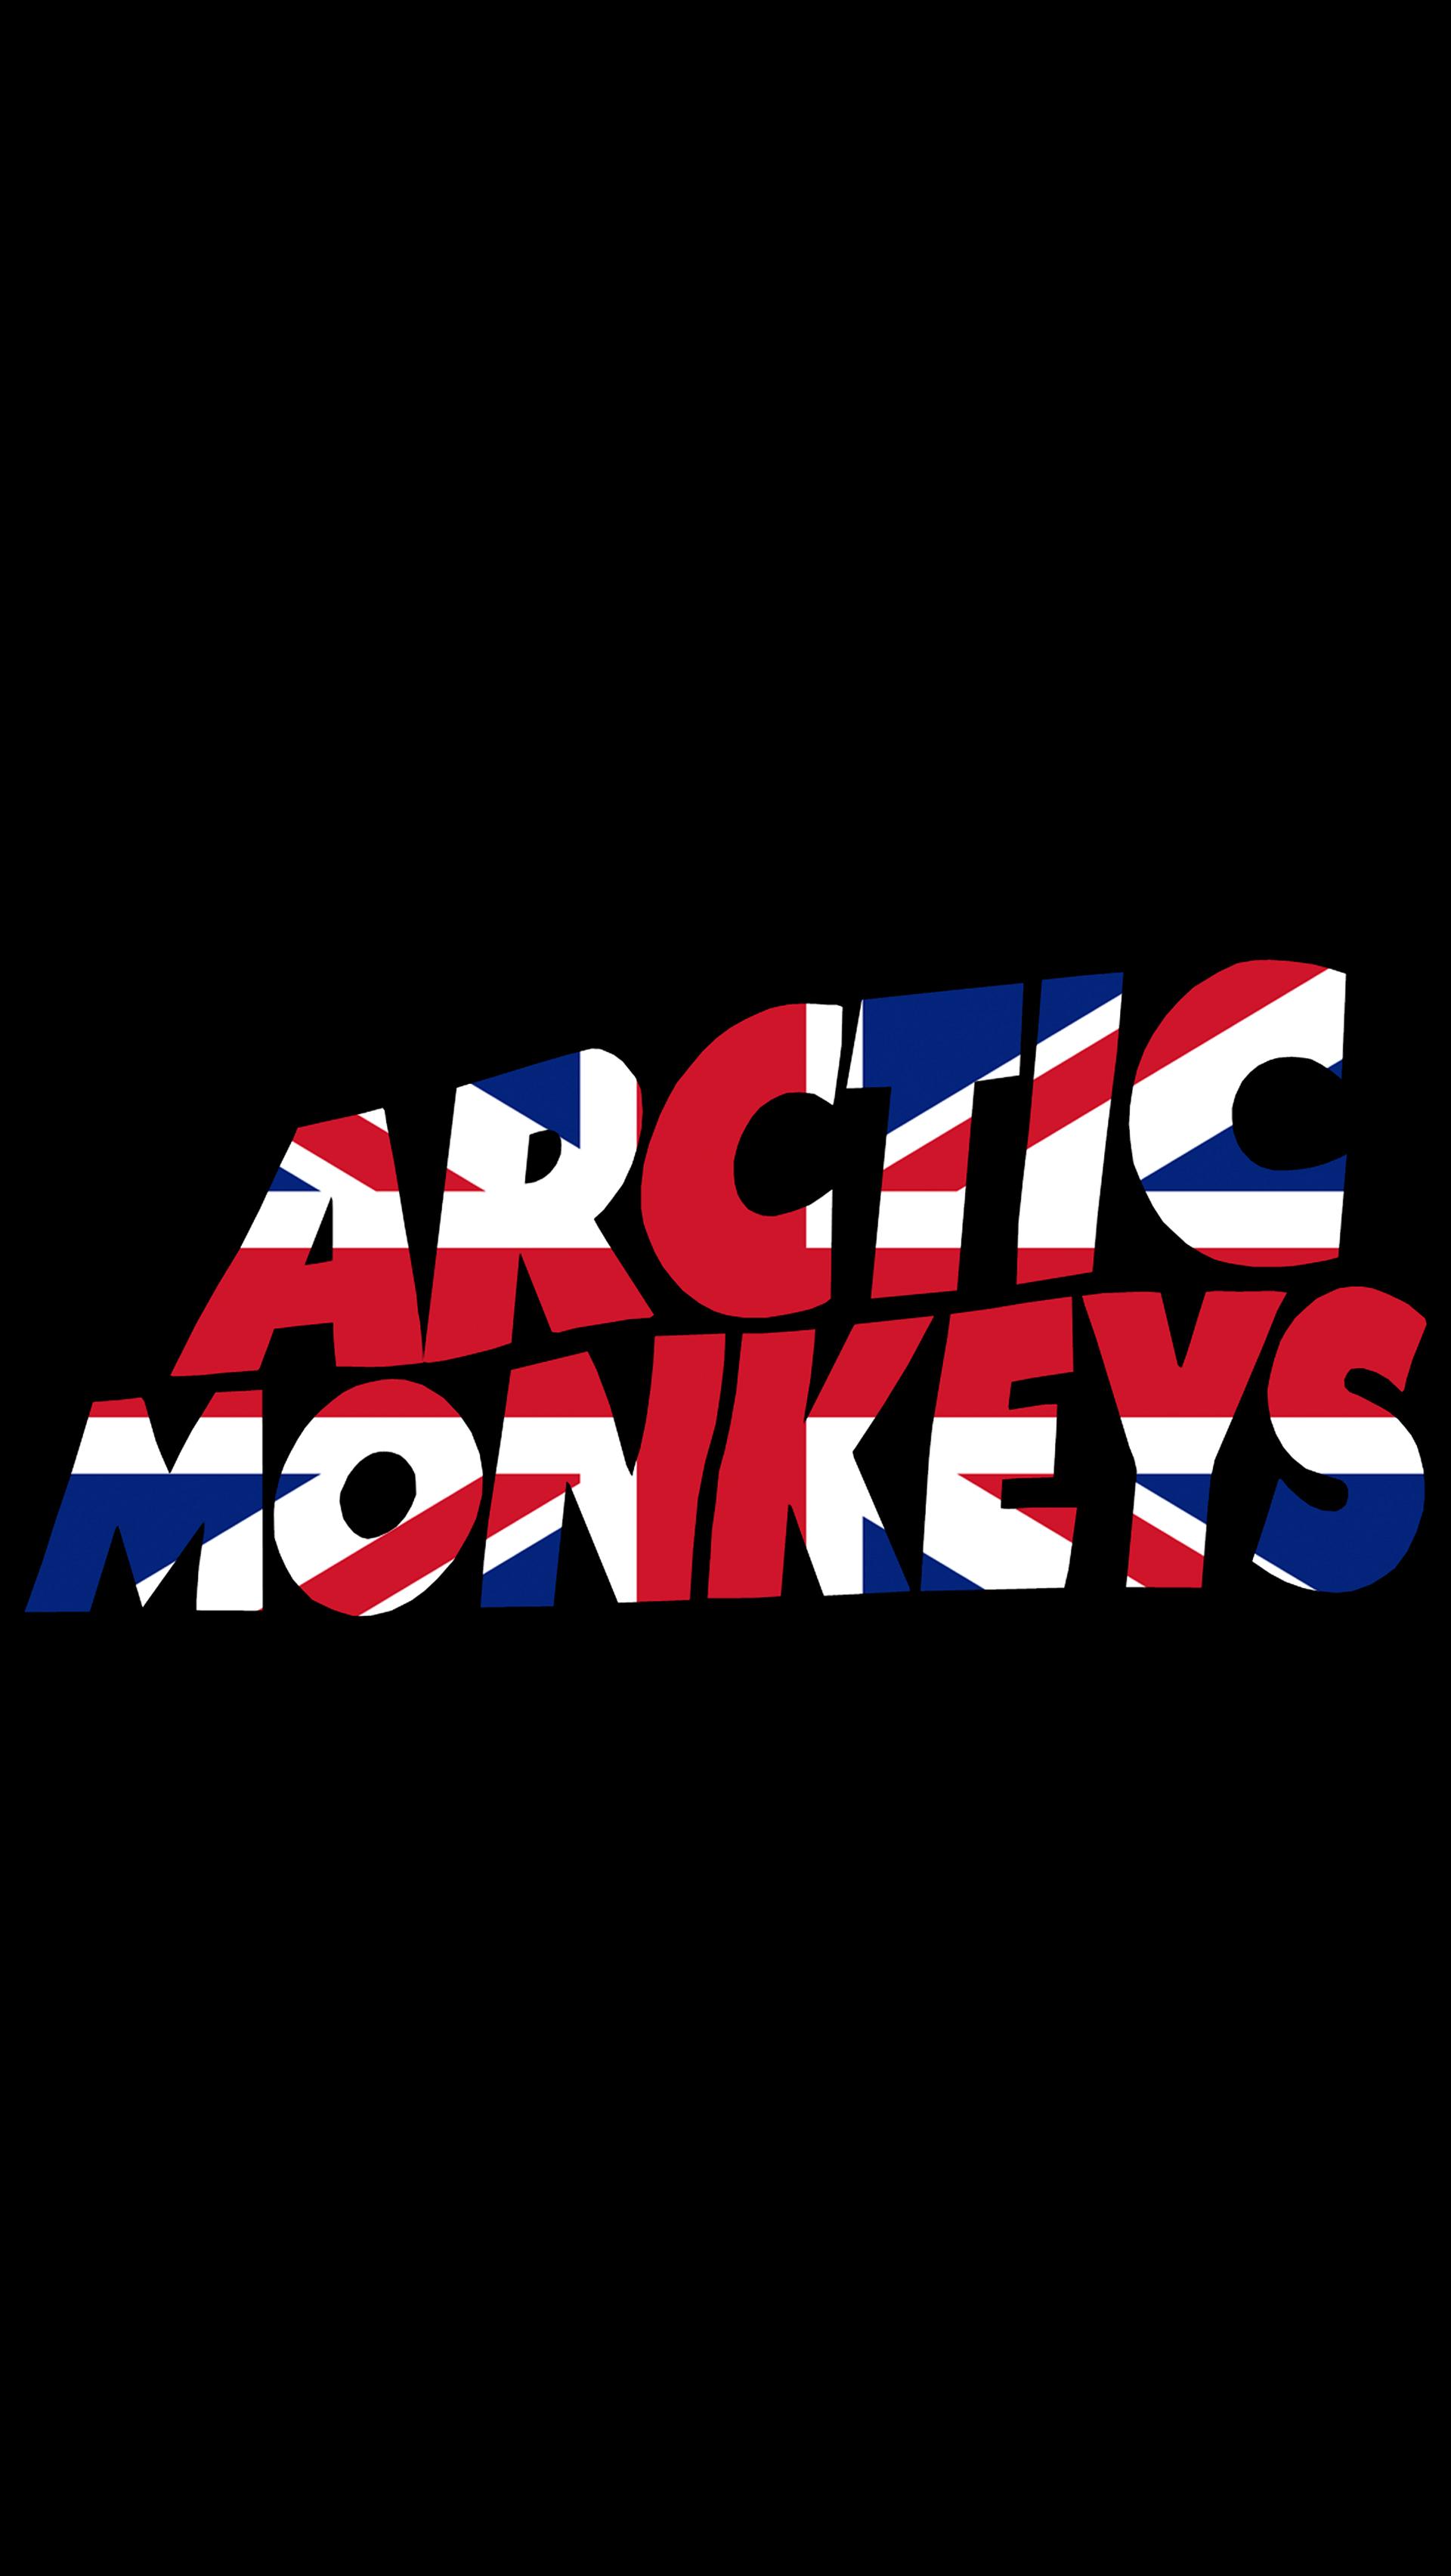 wallpaper arctic monkeys iphone